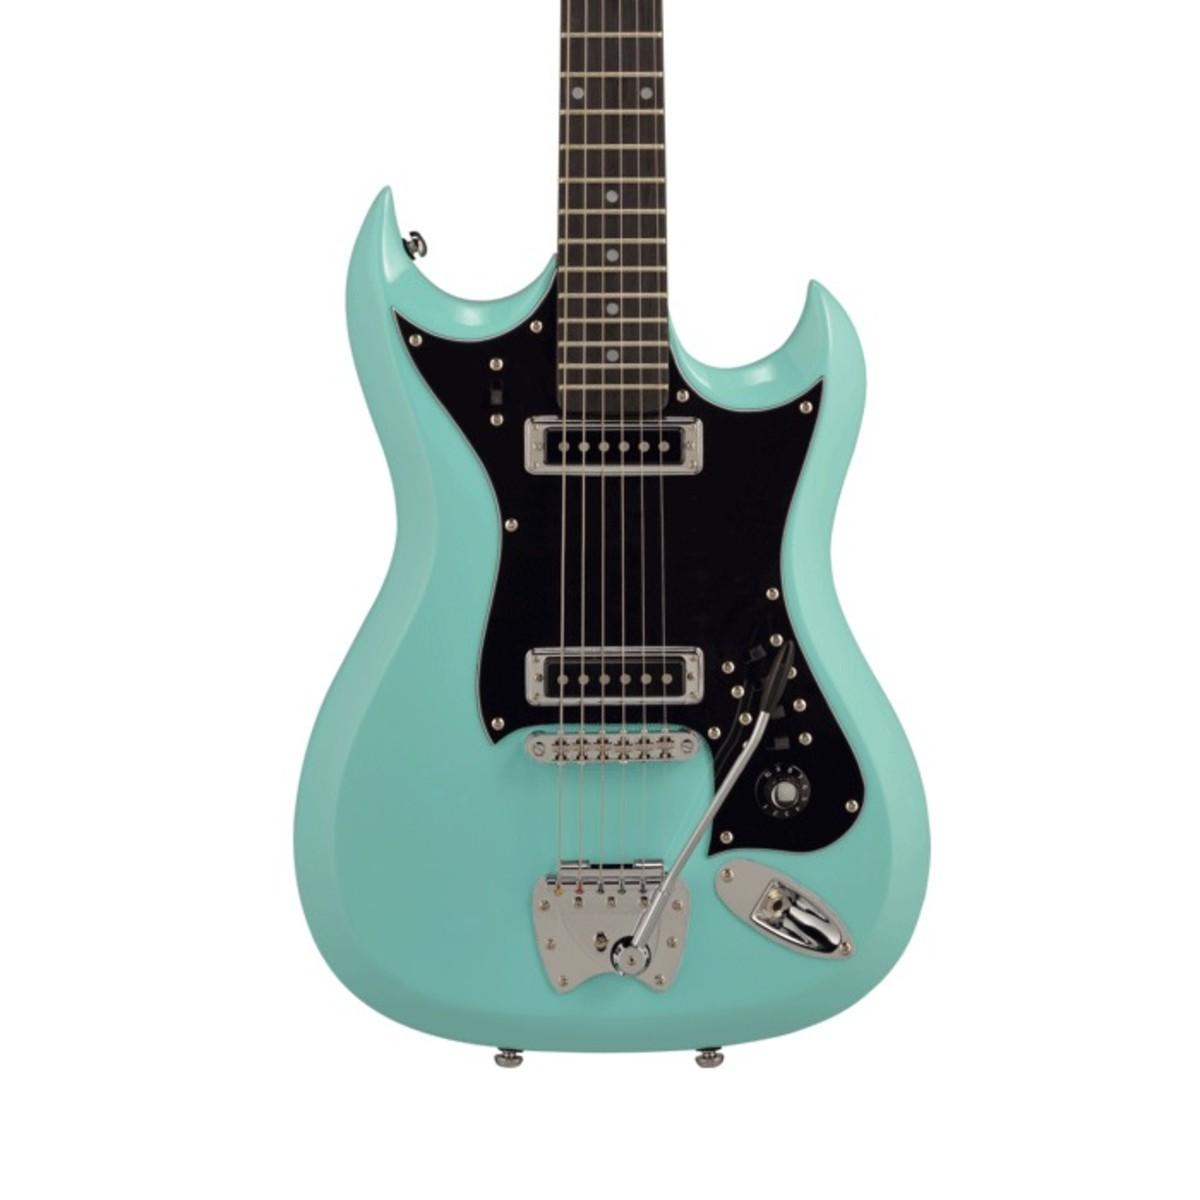 Hagstrom H-II Electric Guitar, Aged Sky Blue at Gear4music.com